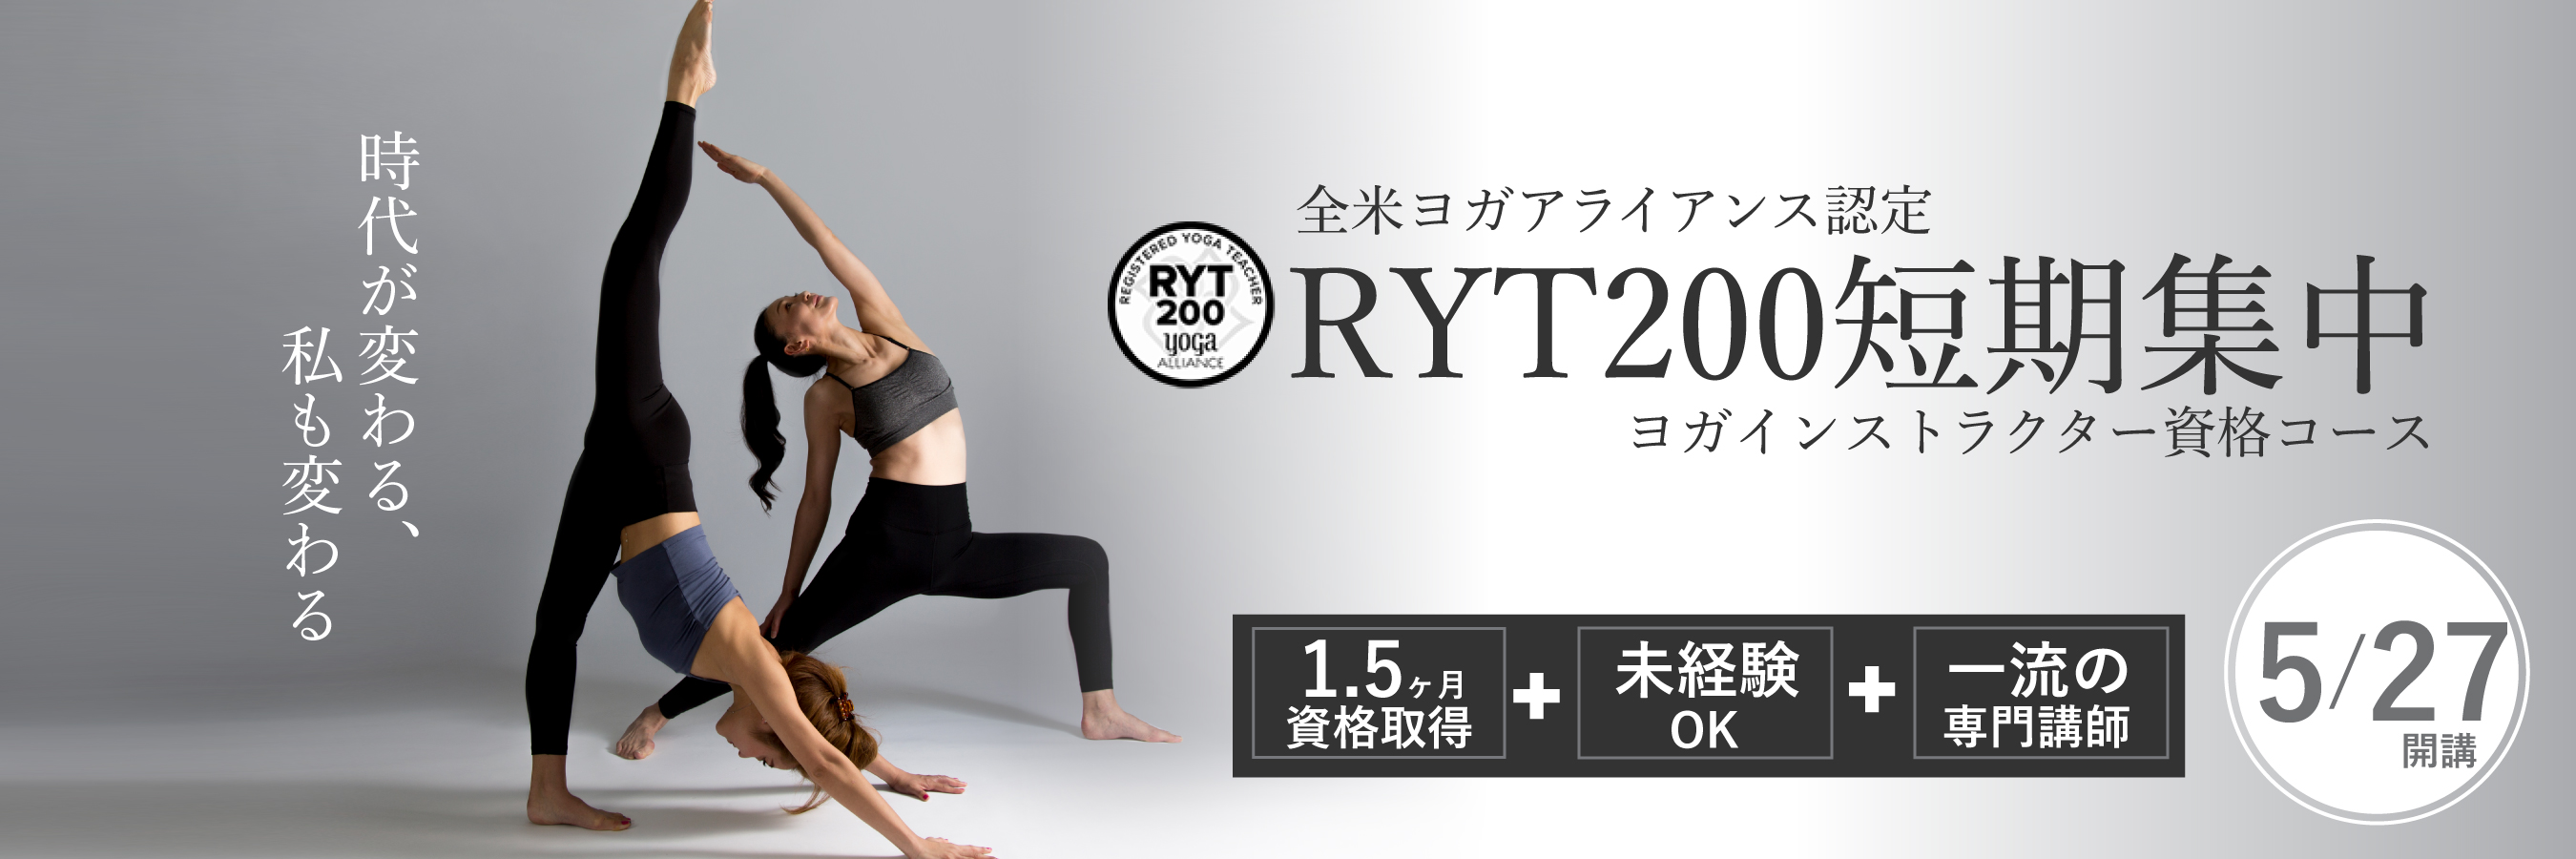 ryt200-intensive